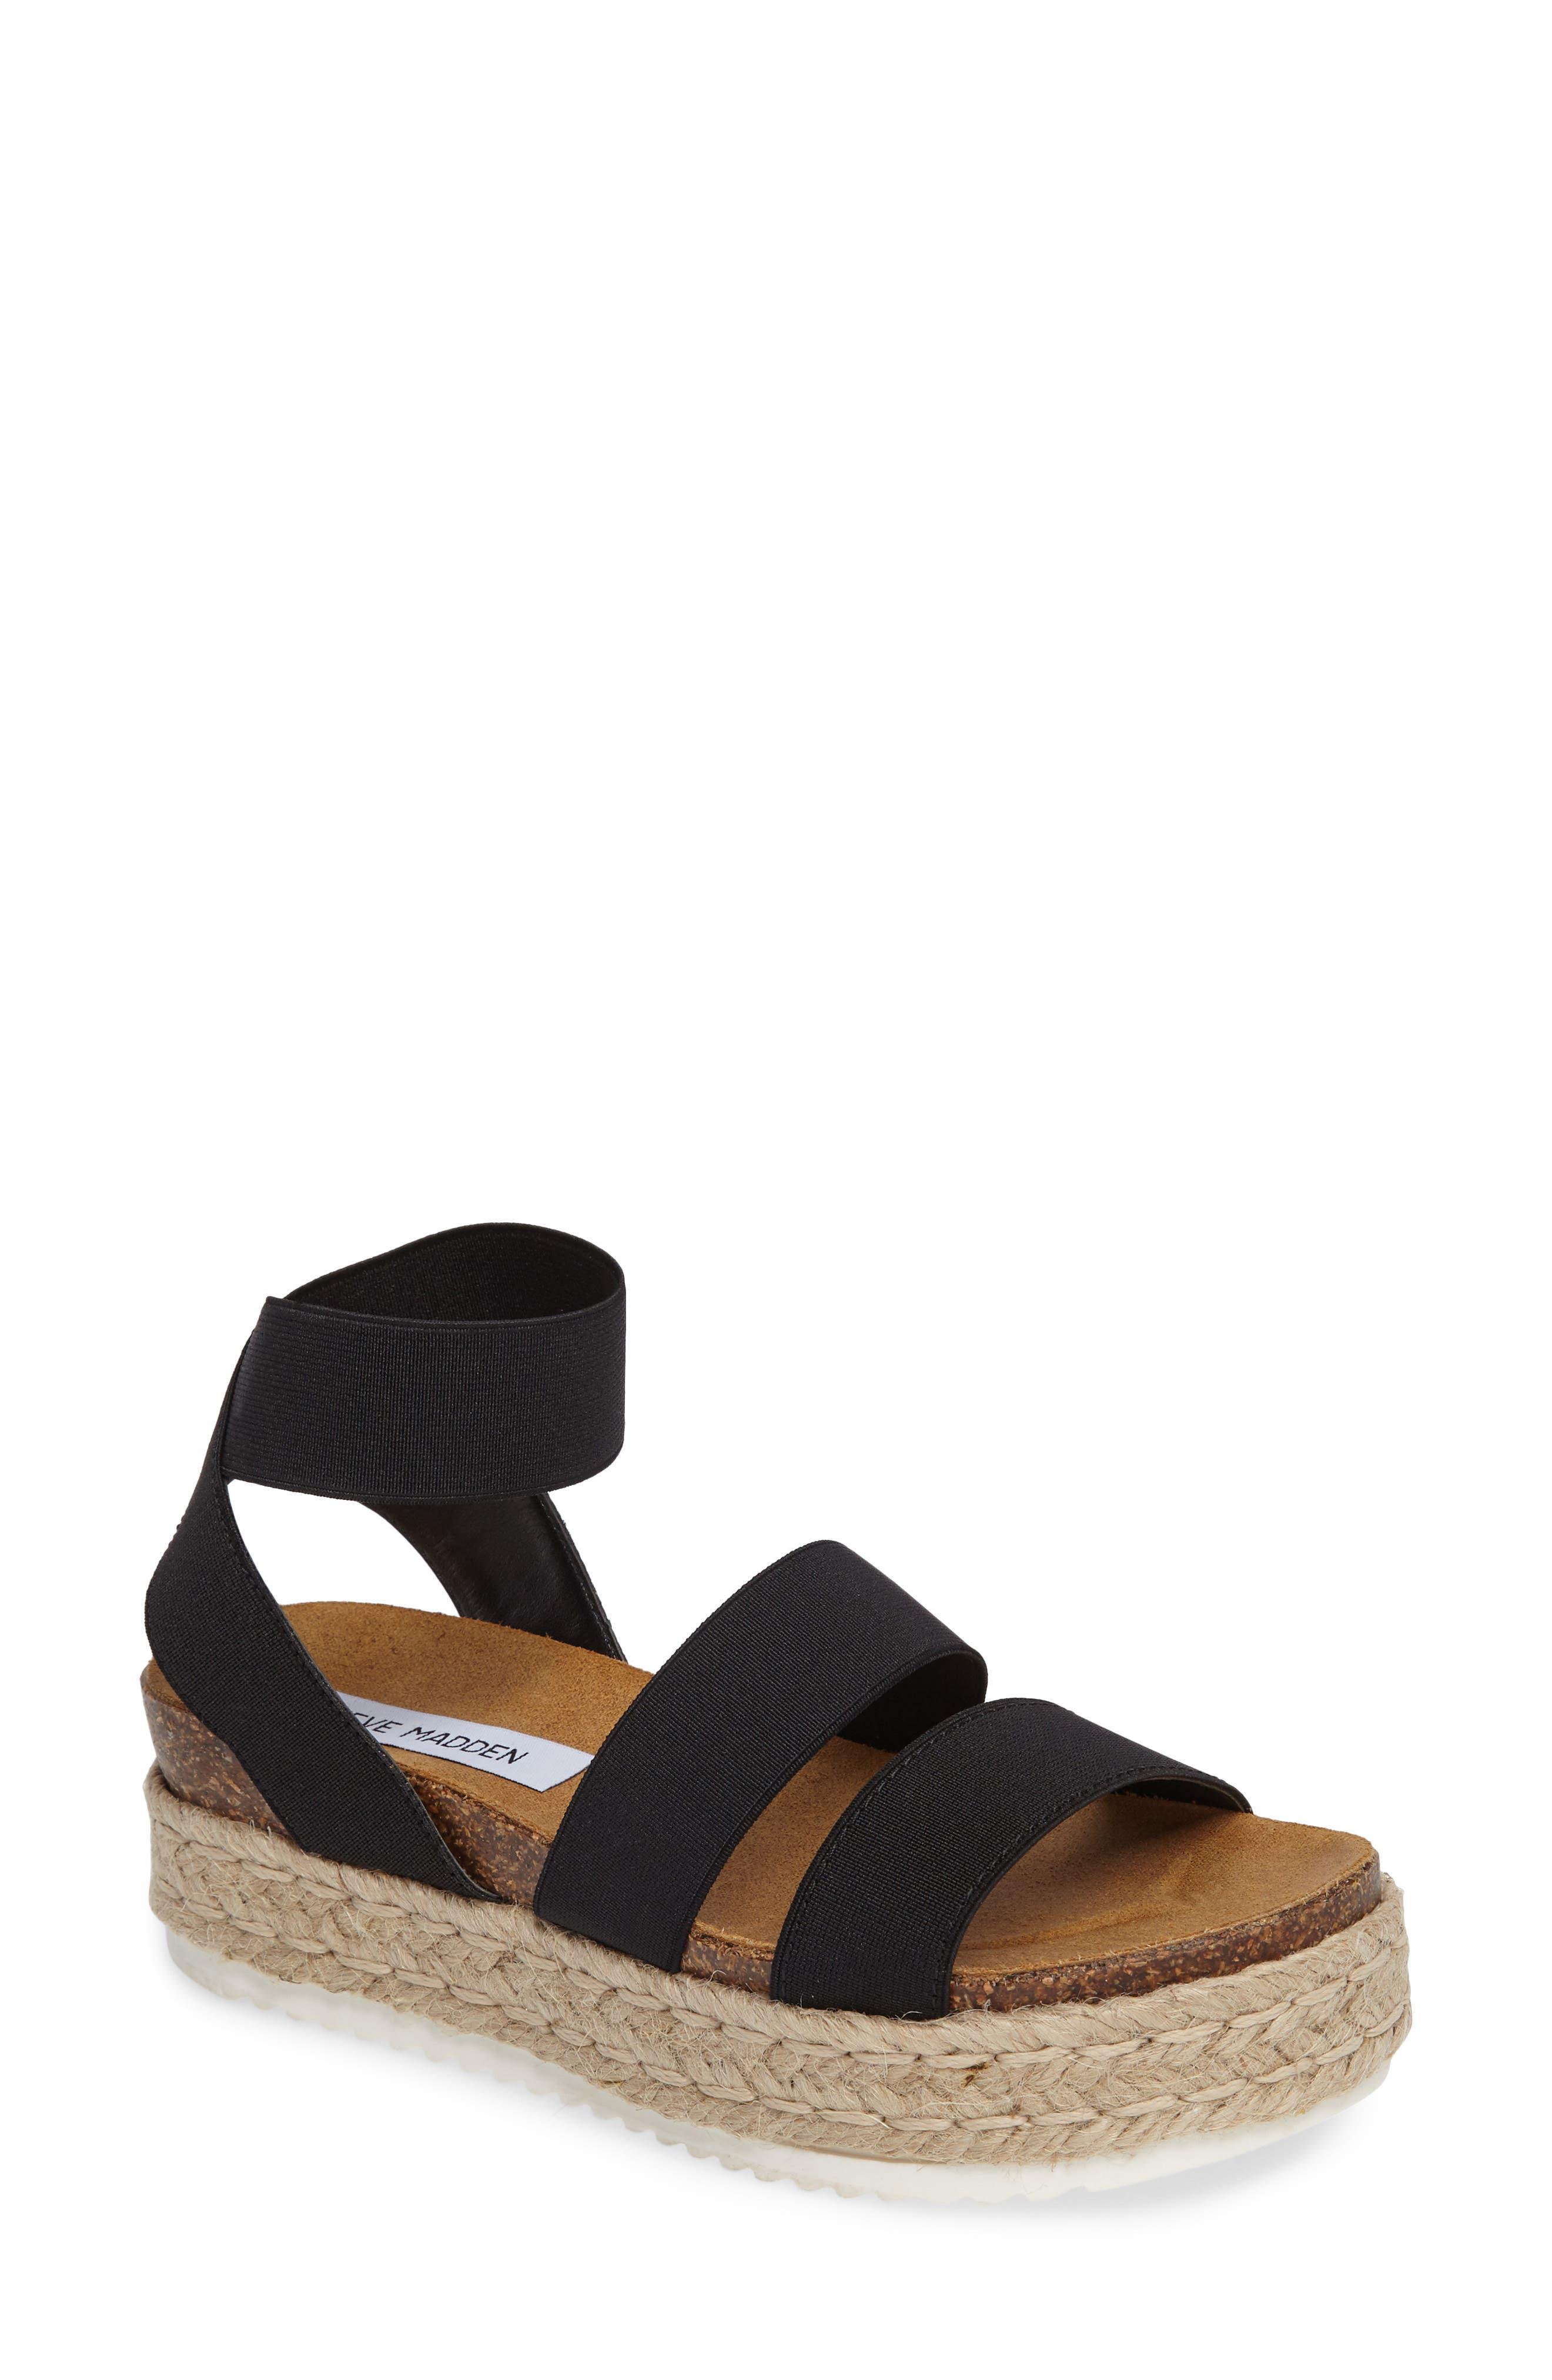 Kimmie Flatform Sandal,                         Main,                         color, 001